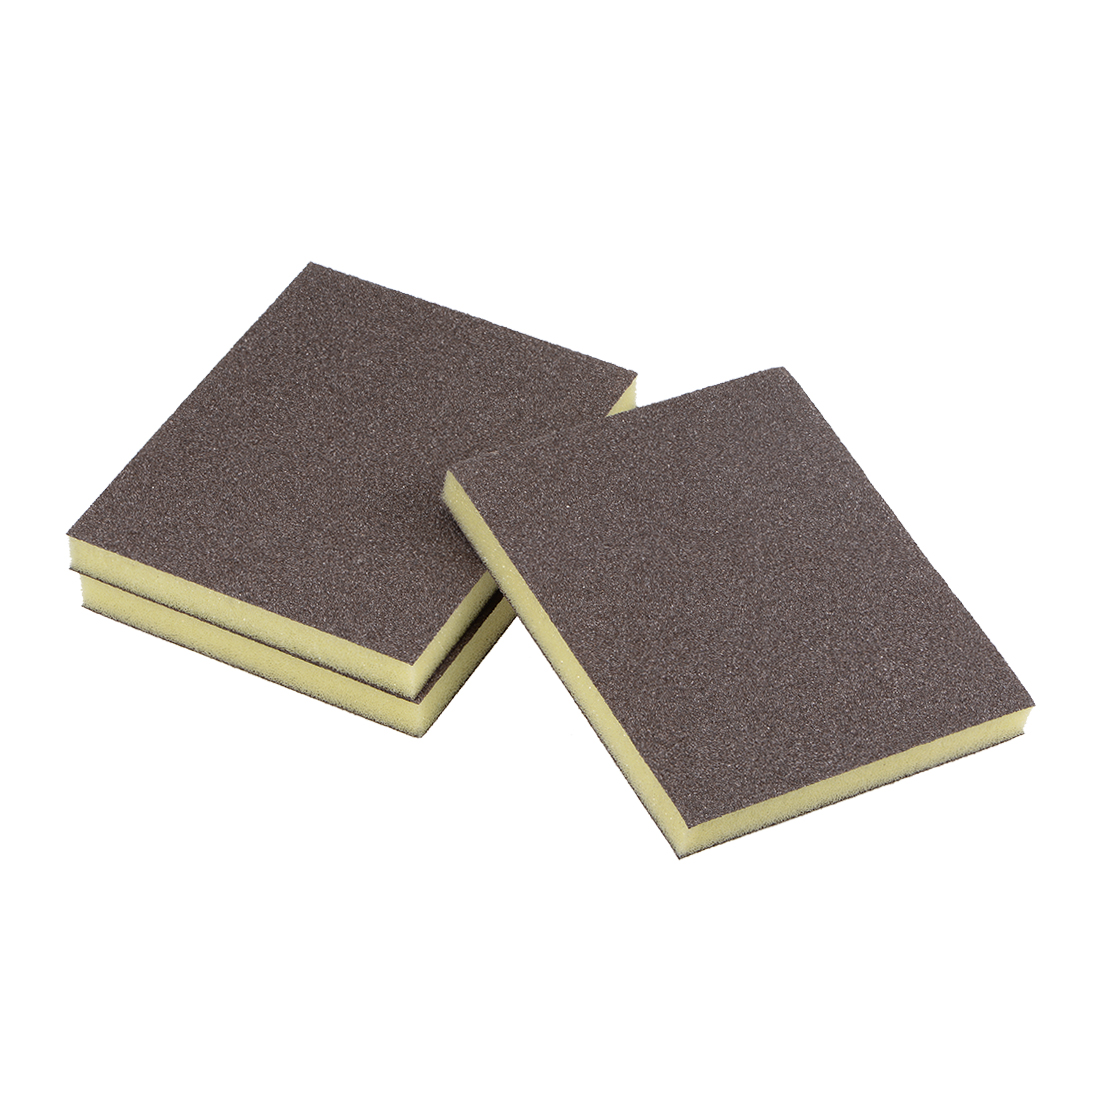 Sanding Sponge 80 Grit Sanding Block Pad Brown 3pcs